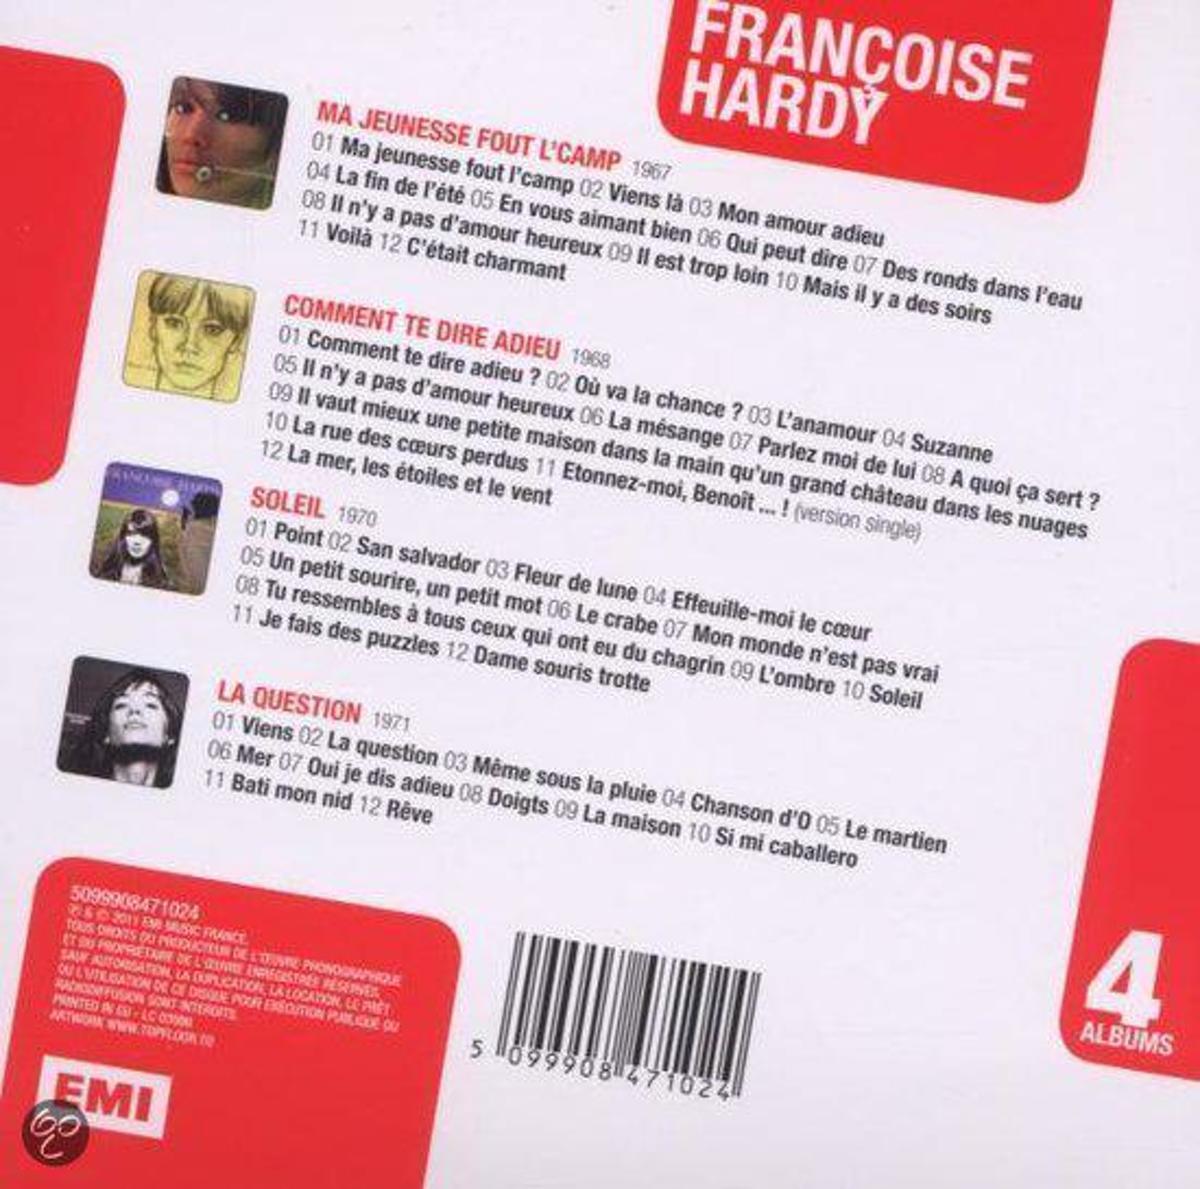 Bol Com Francoise Hardy Box 4cd Ma Jeunesse Le Sol Francoise